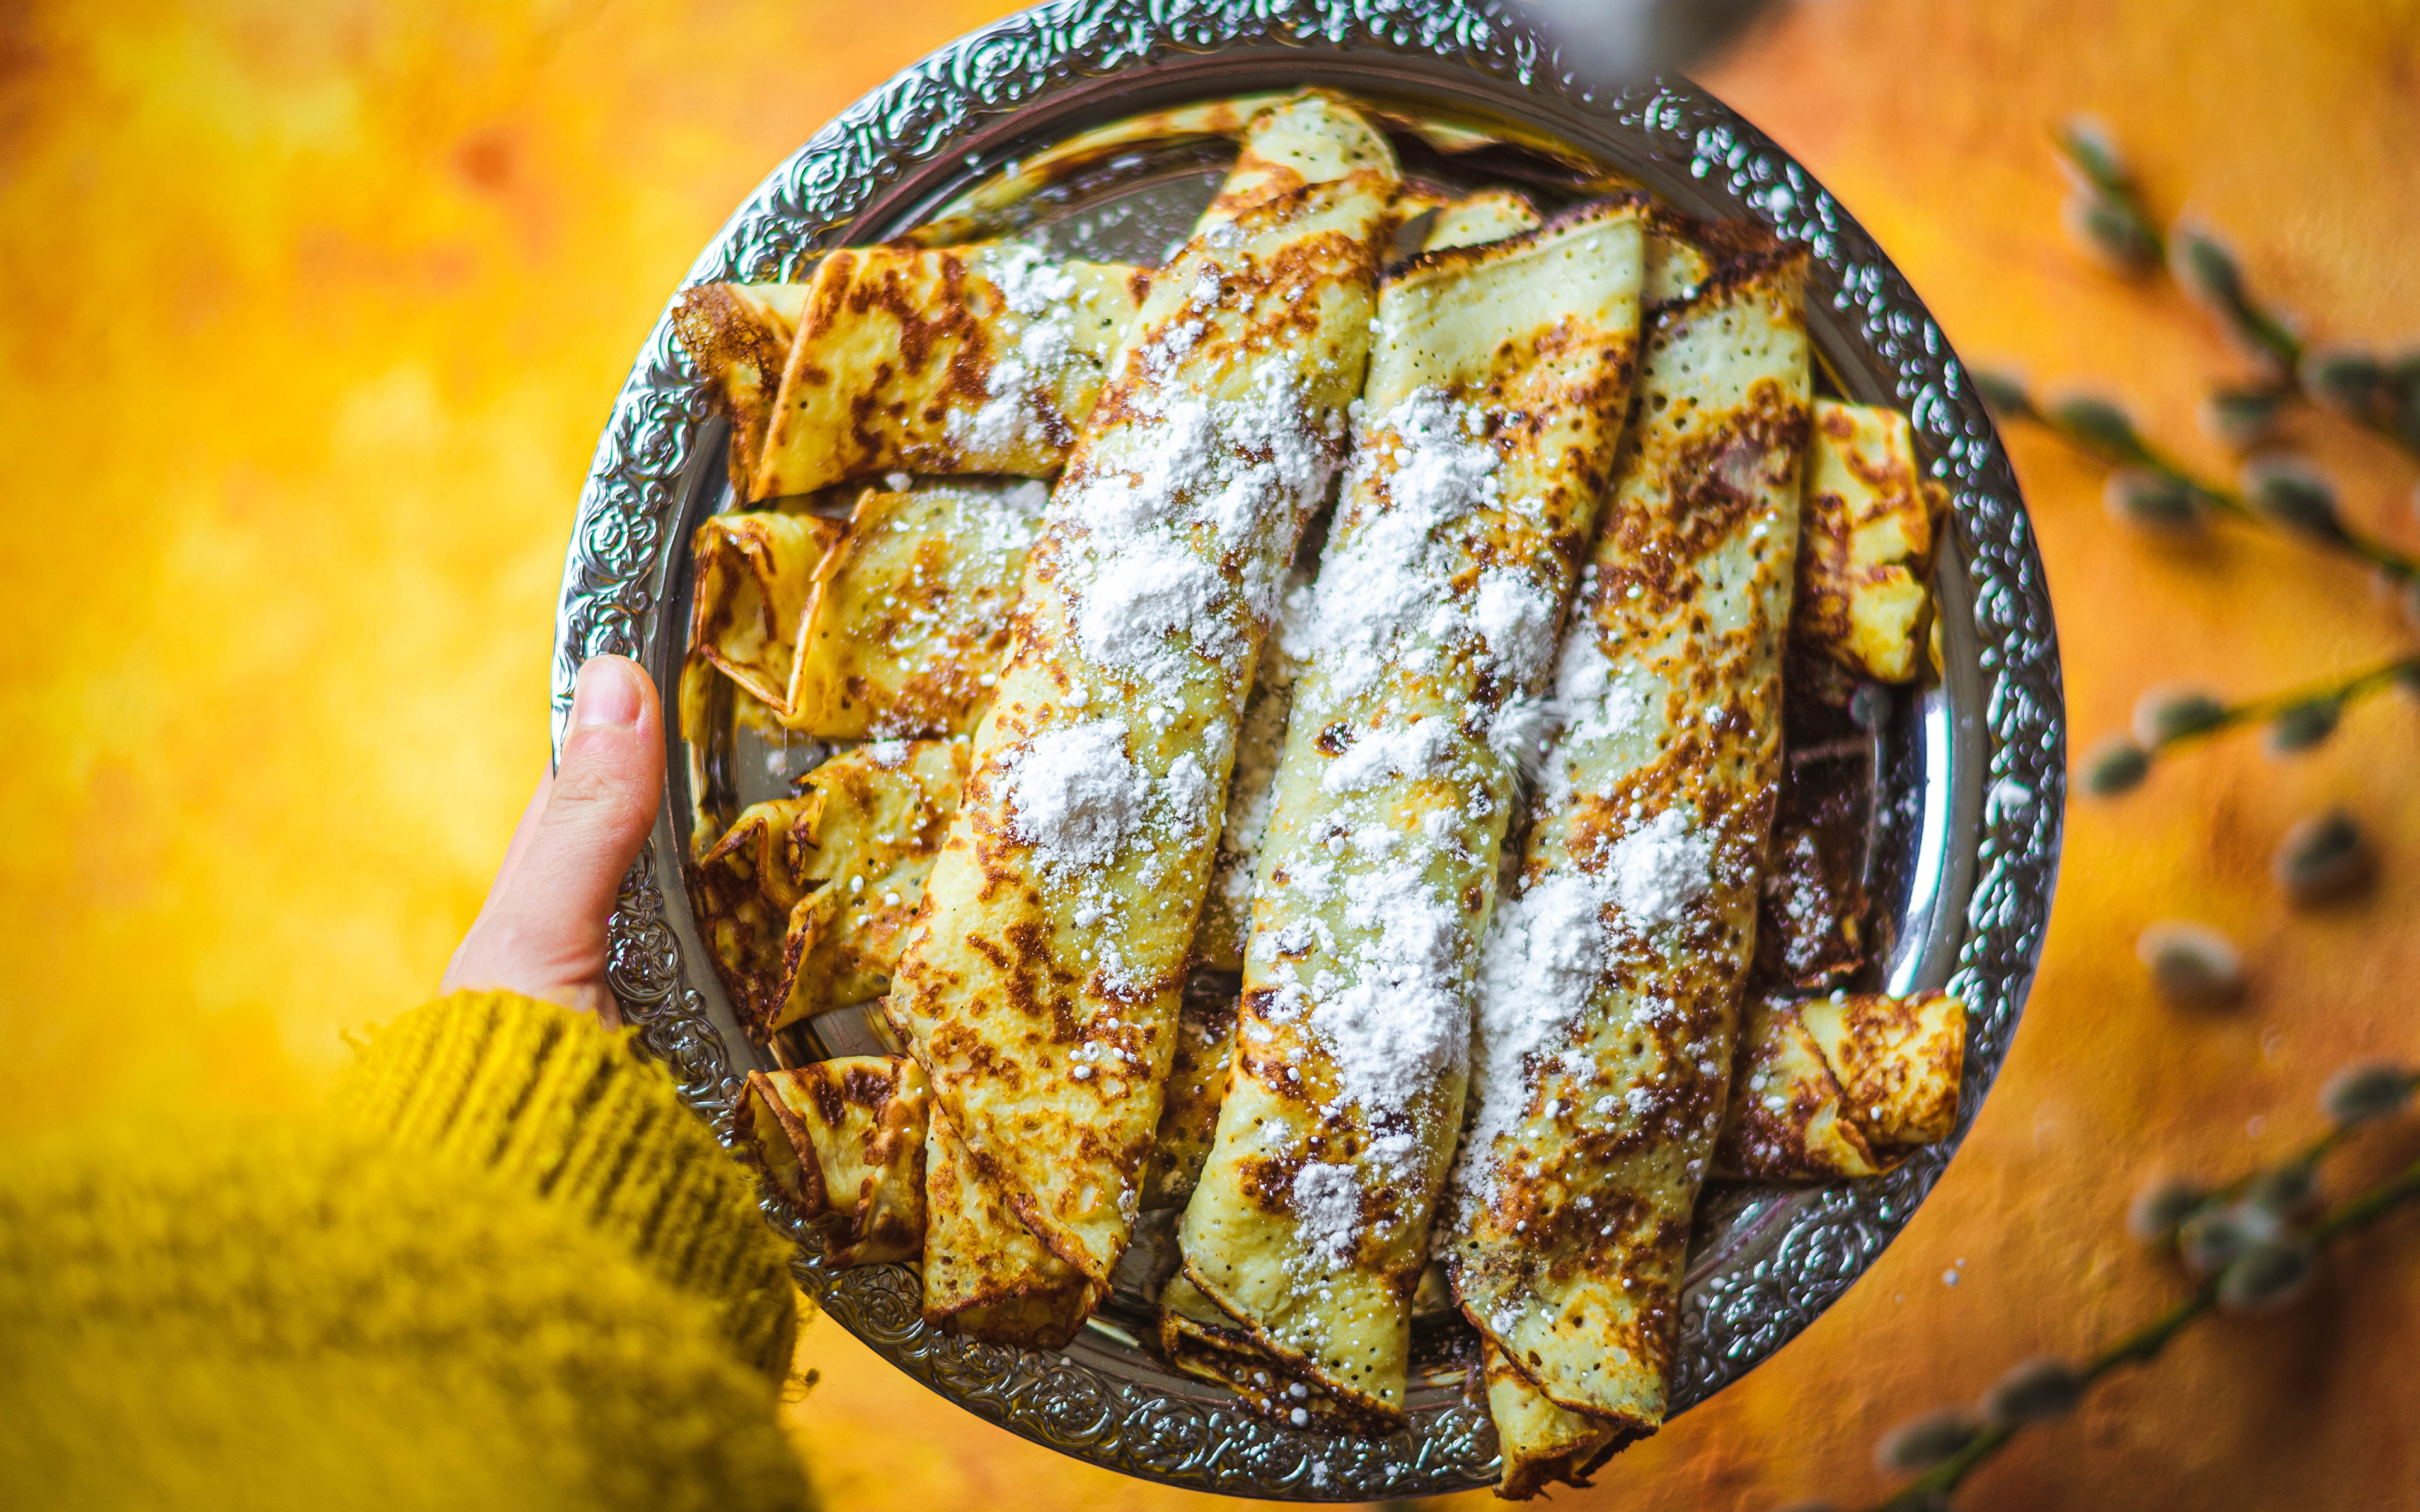 Картинка Блины Сахарная пудра тарелке Продукты питания 3840x2400 Еда Пища Тарелка